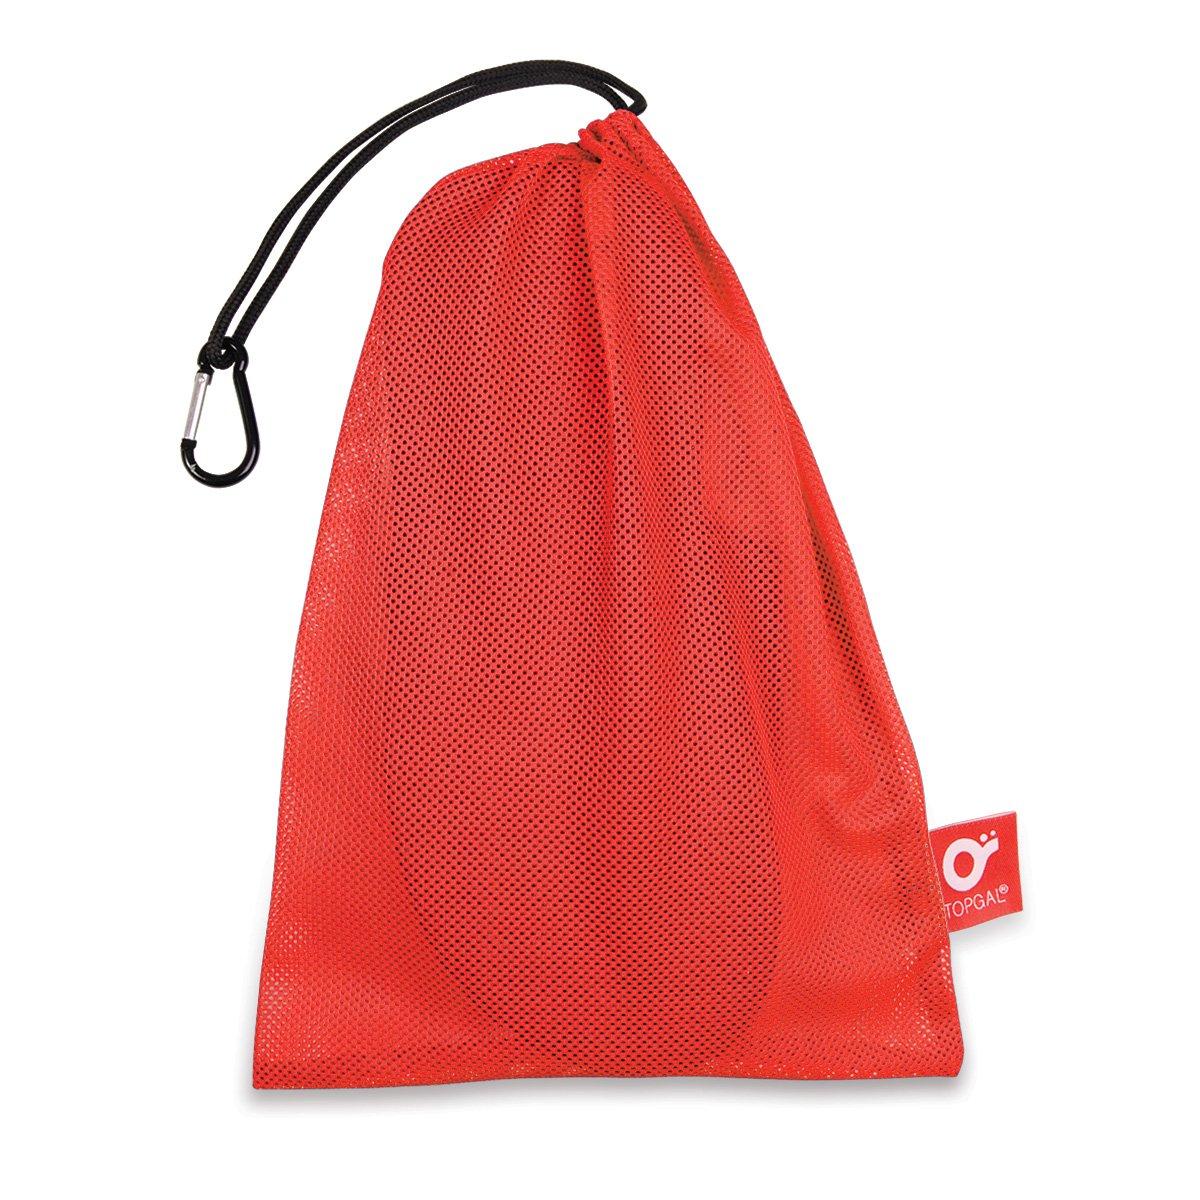 Vrecko na prezuvky Topgal TOP 150 G - Red